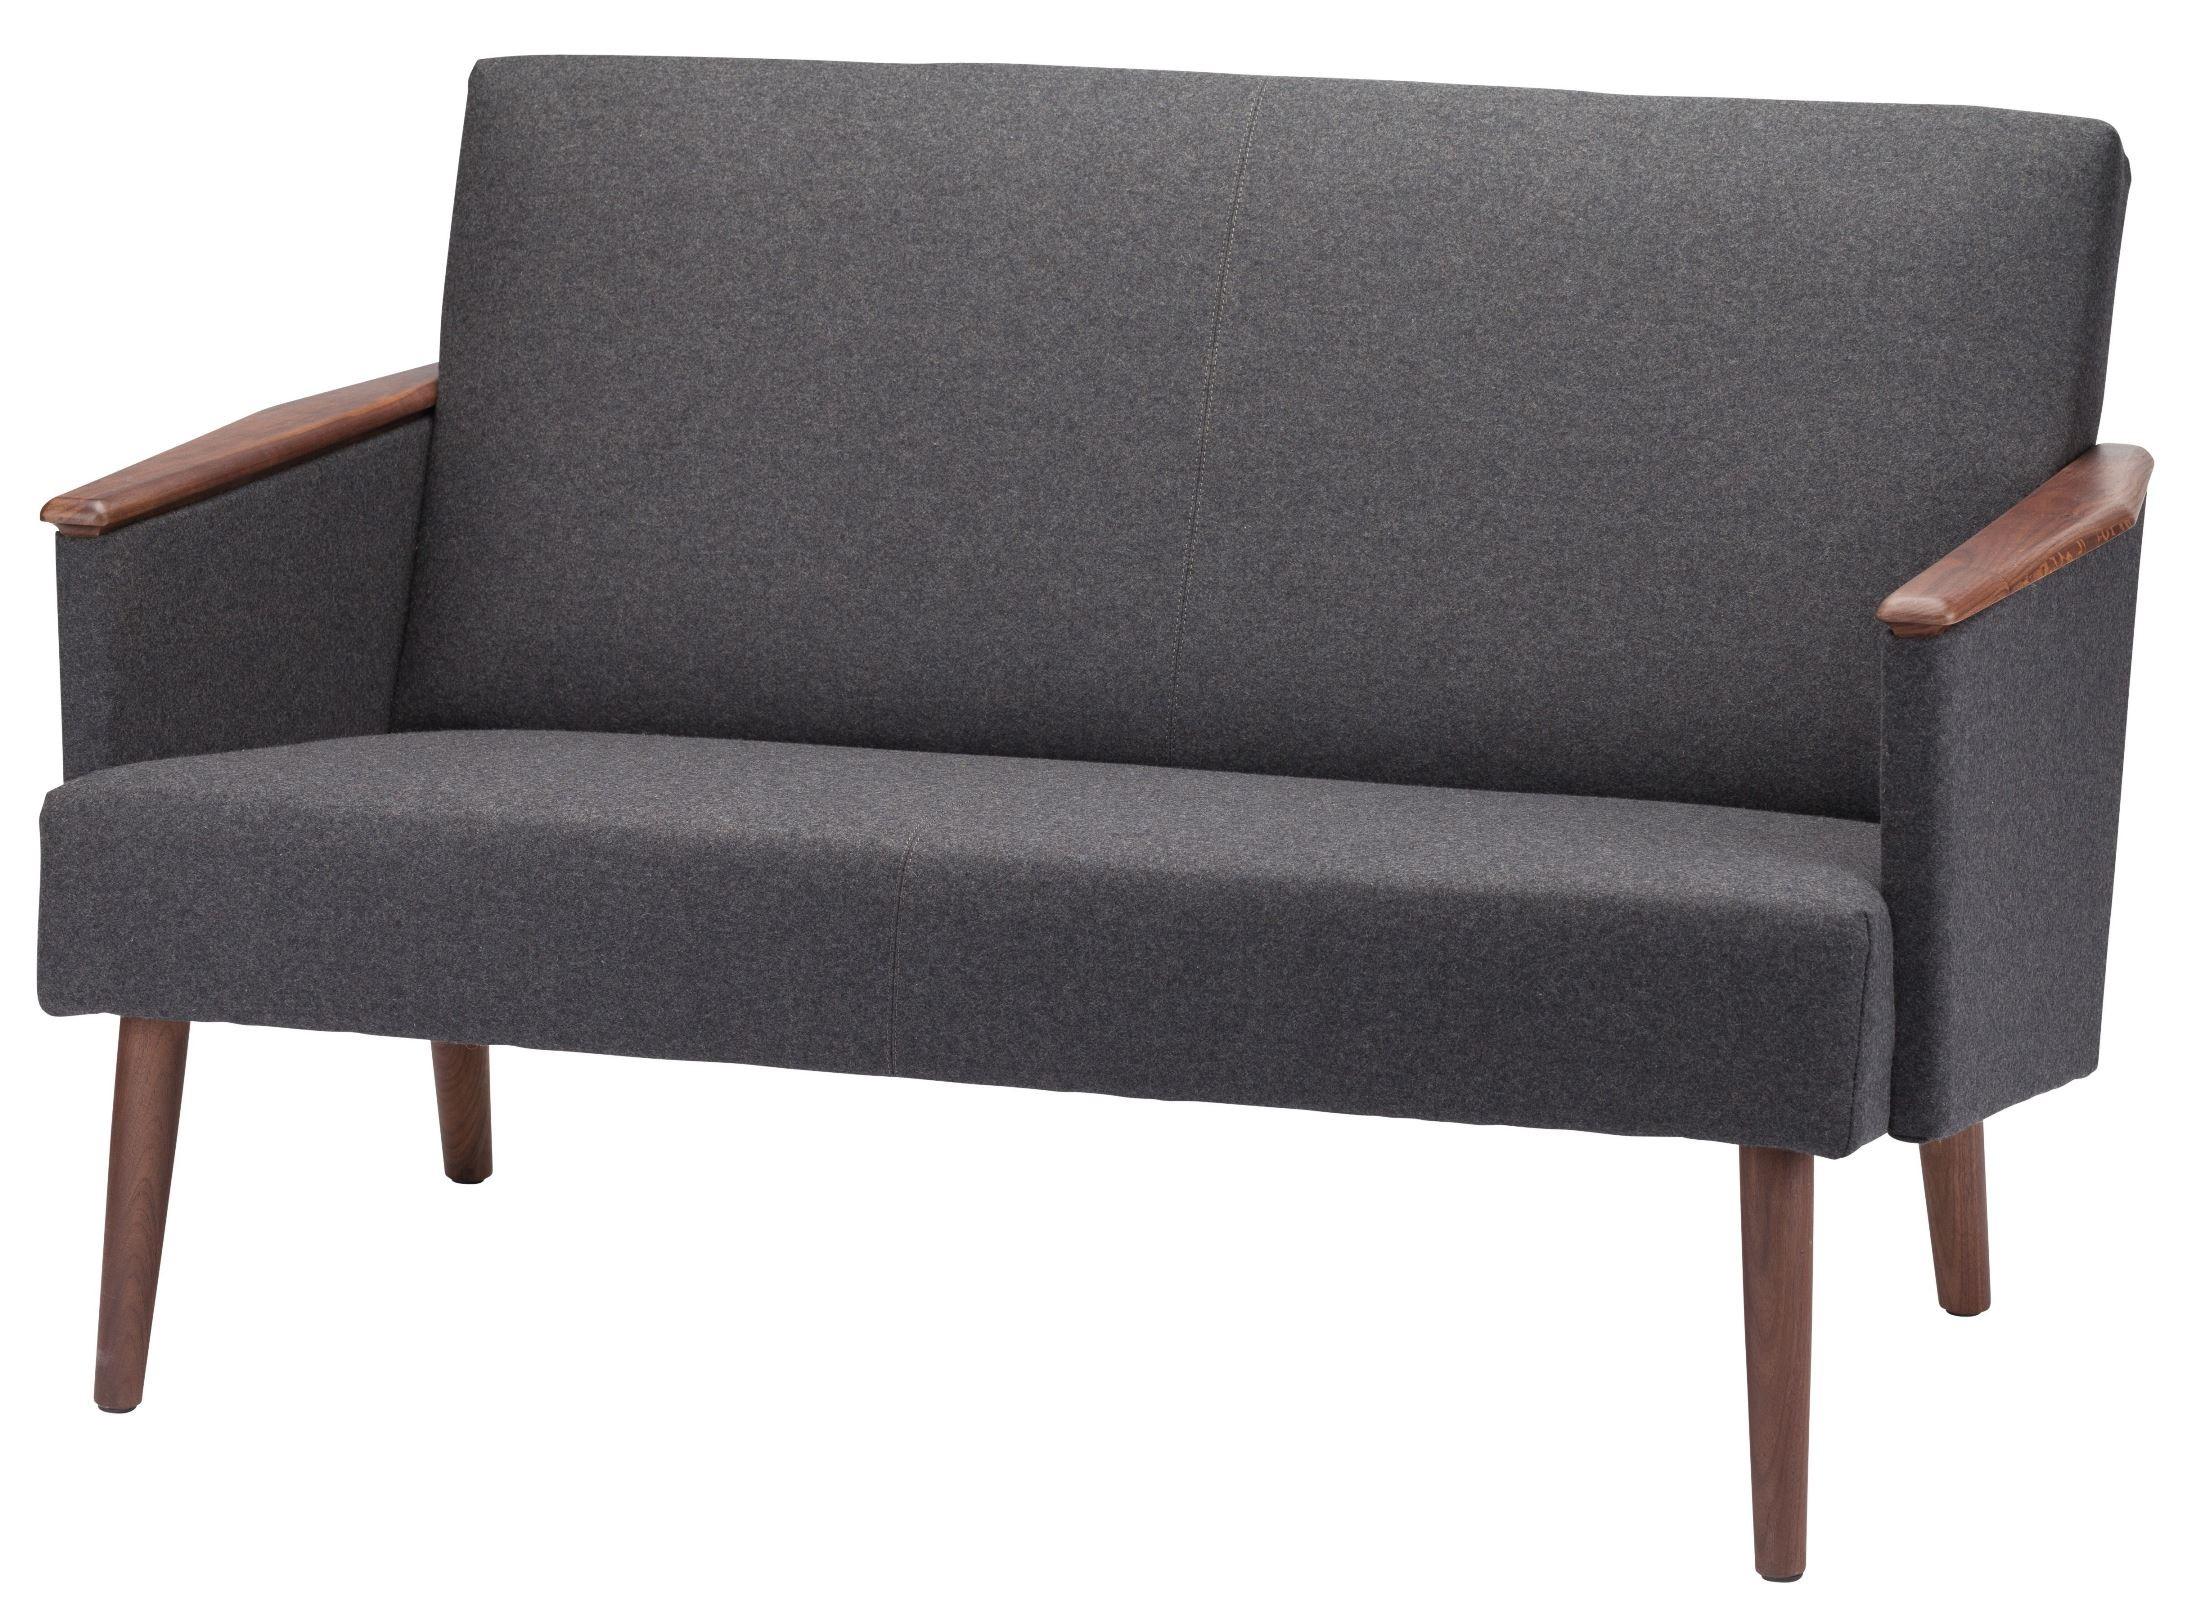 gray fabric sofa chair modern tufted futon bed jasper grey hgem639 nuevo